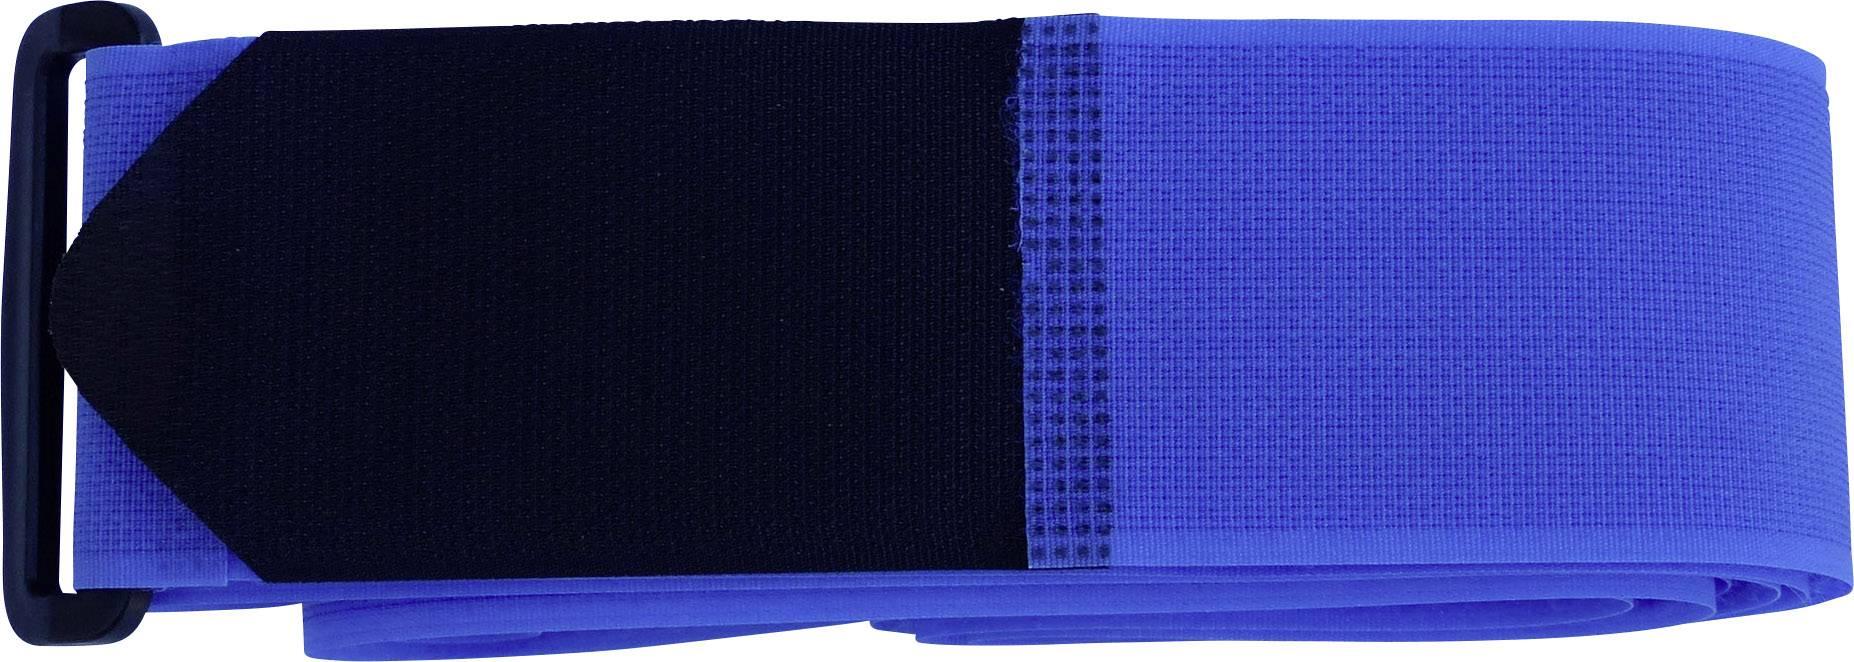 Pásek na kufr se suchým ziprm TRU COMPONENTS 922-0426-Bag, modrá, 1 ks